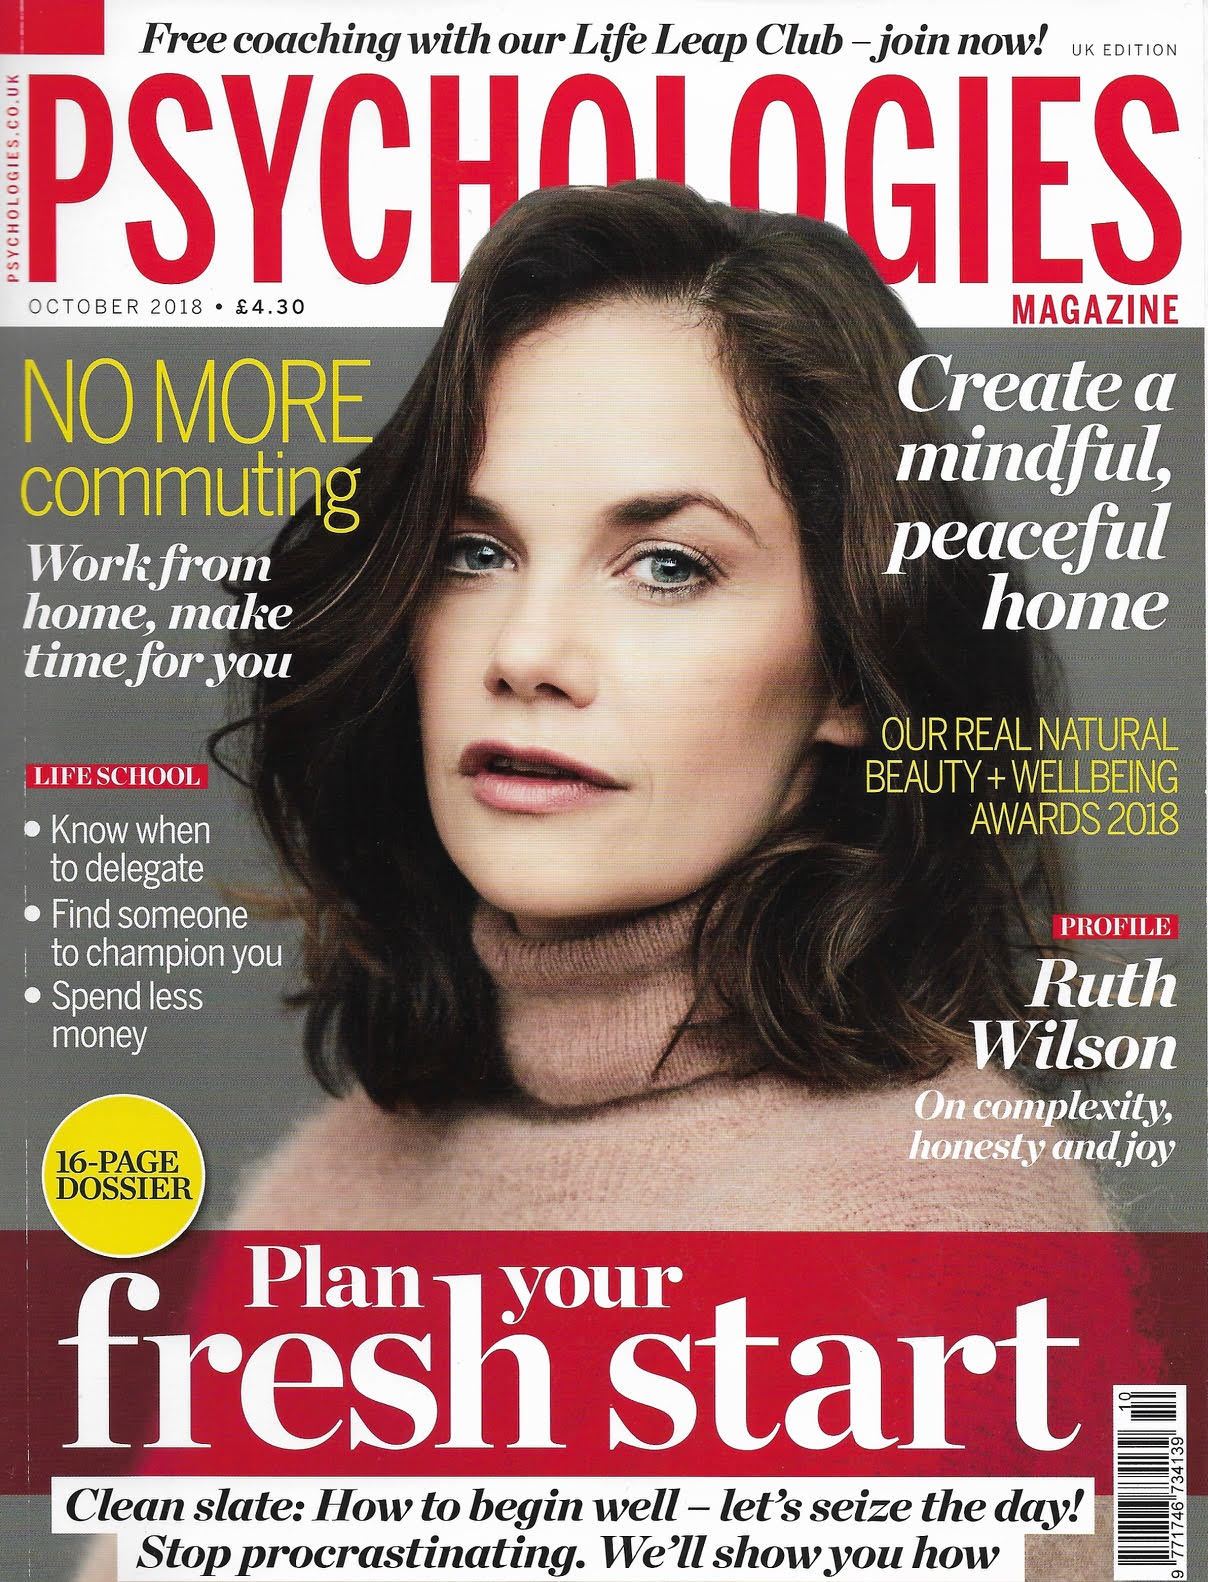 Psychologies magazine Joudie kalla